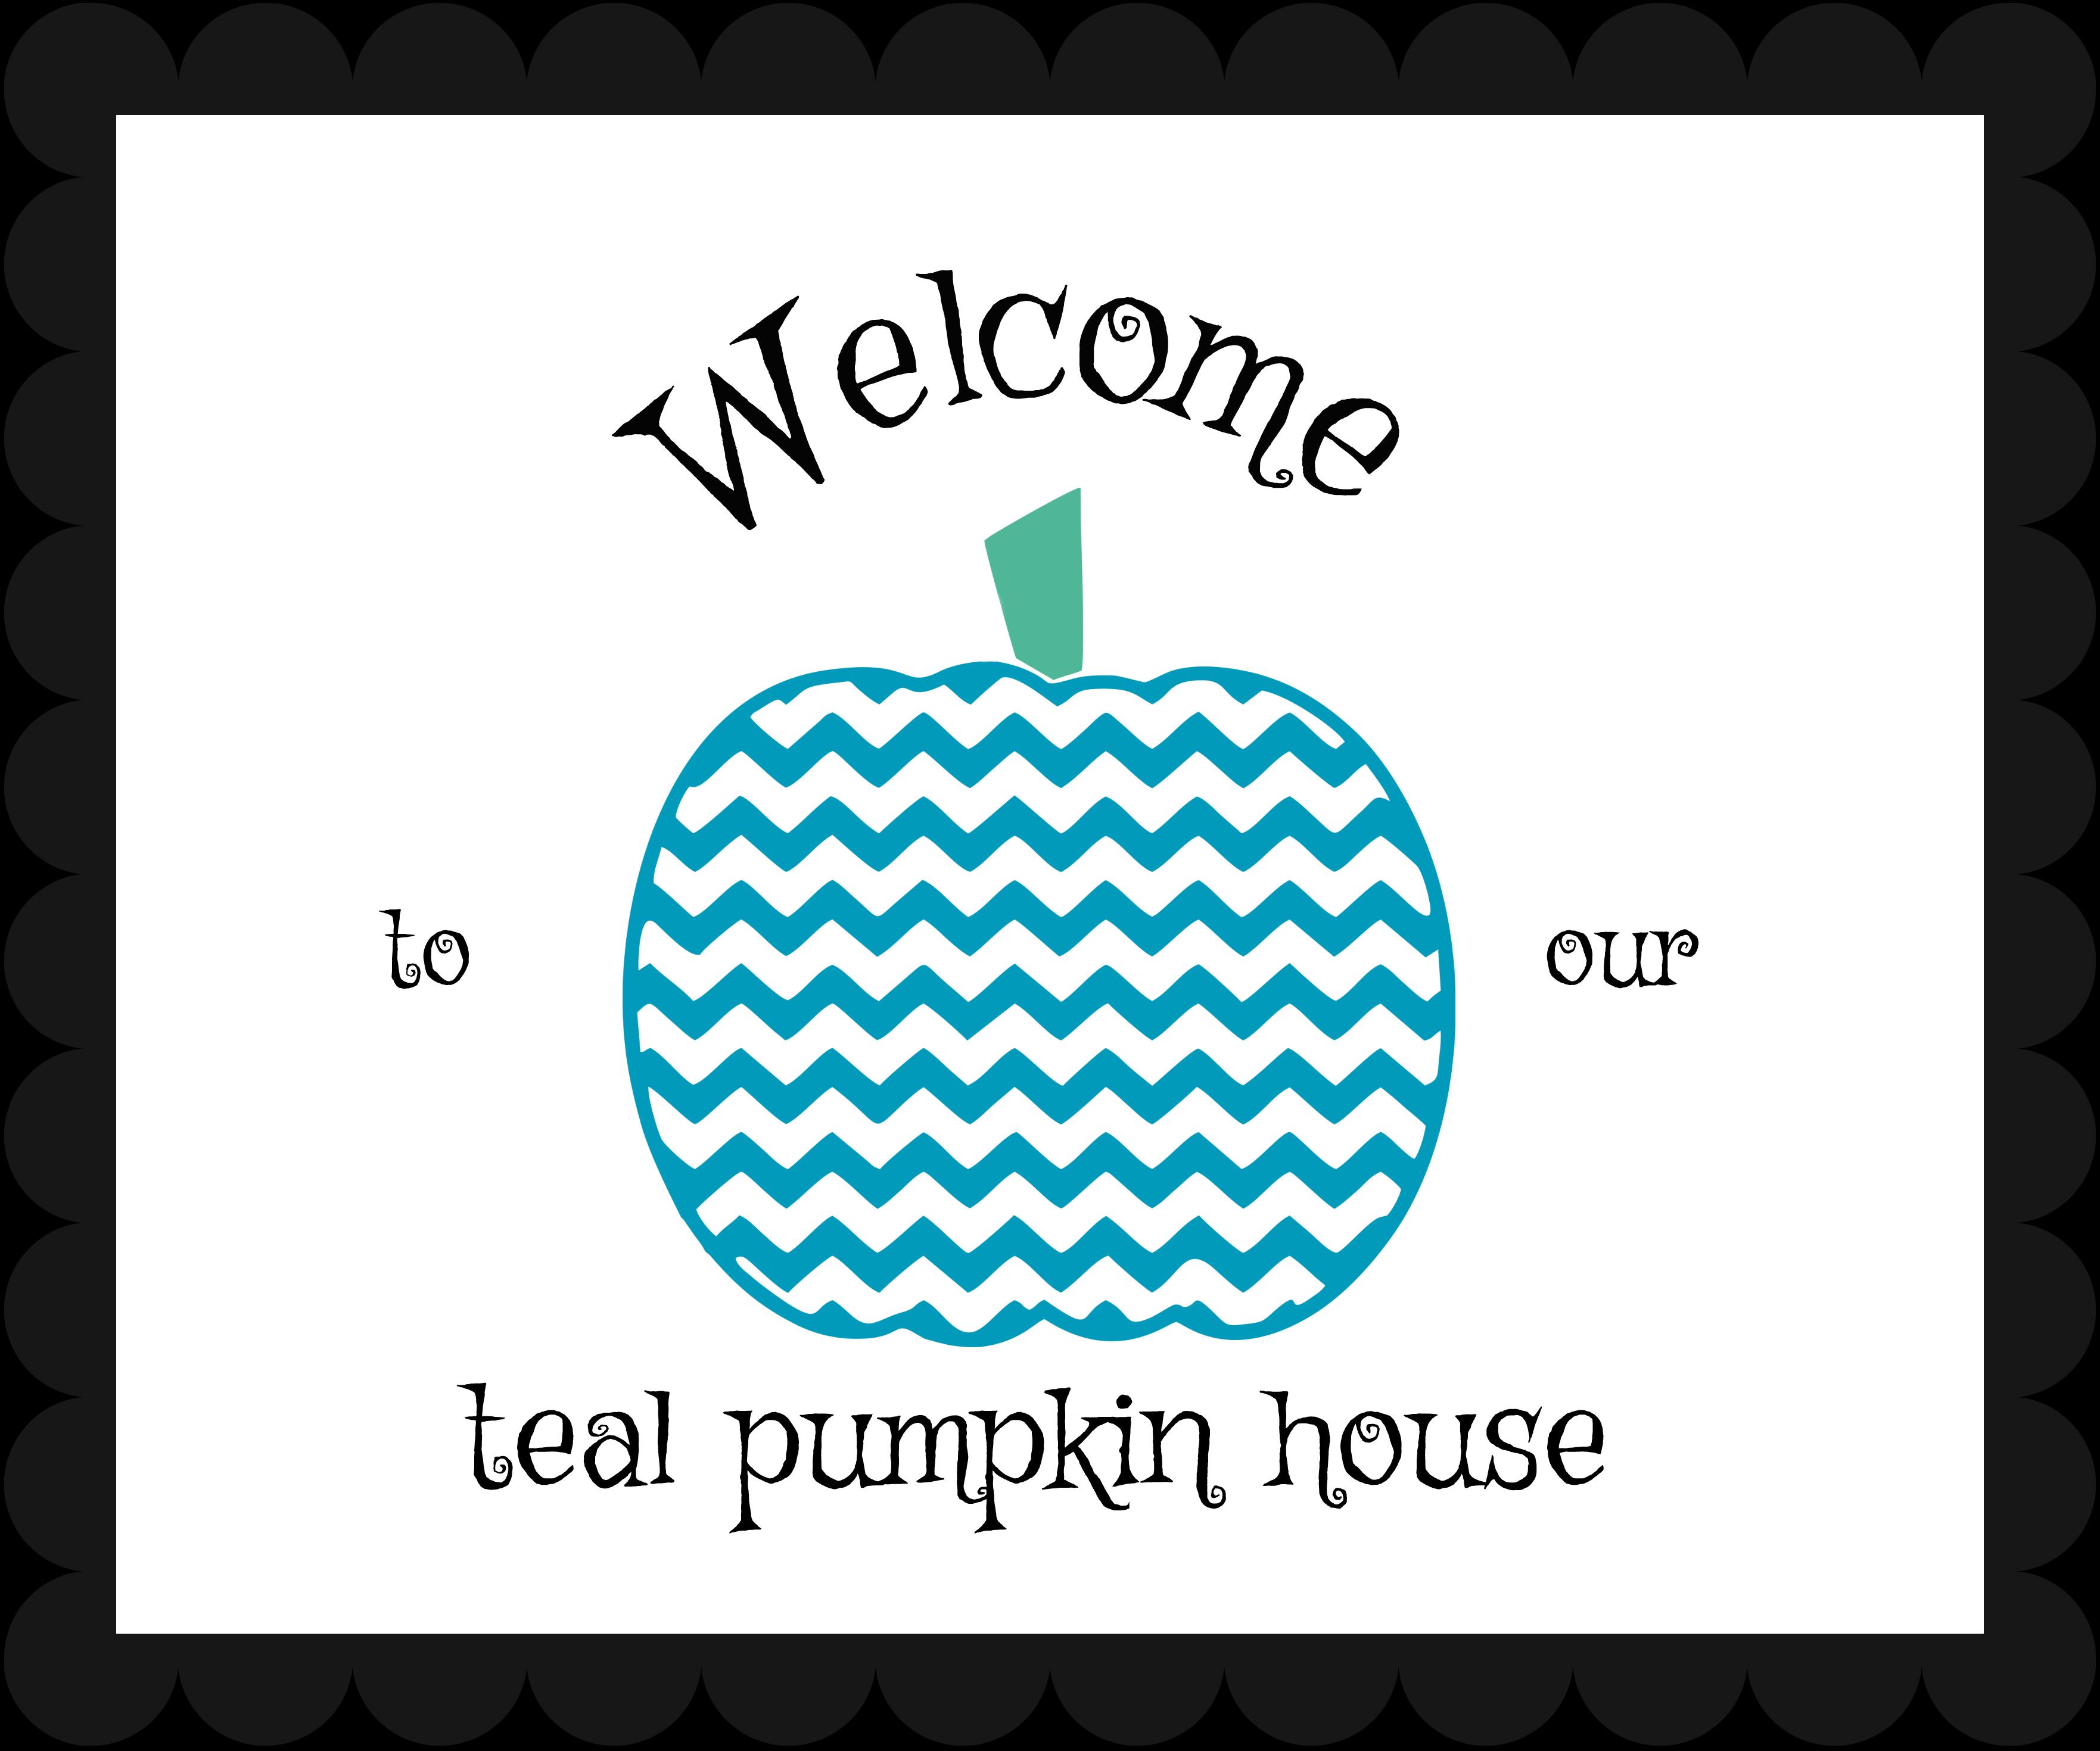 Teal pumpkin welcome sign for Halloween.